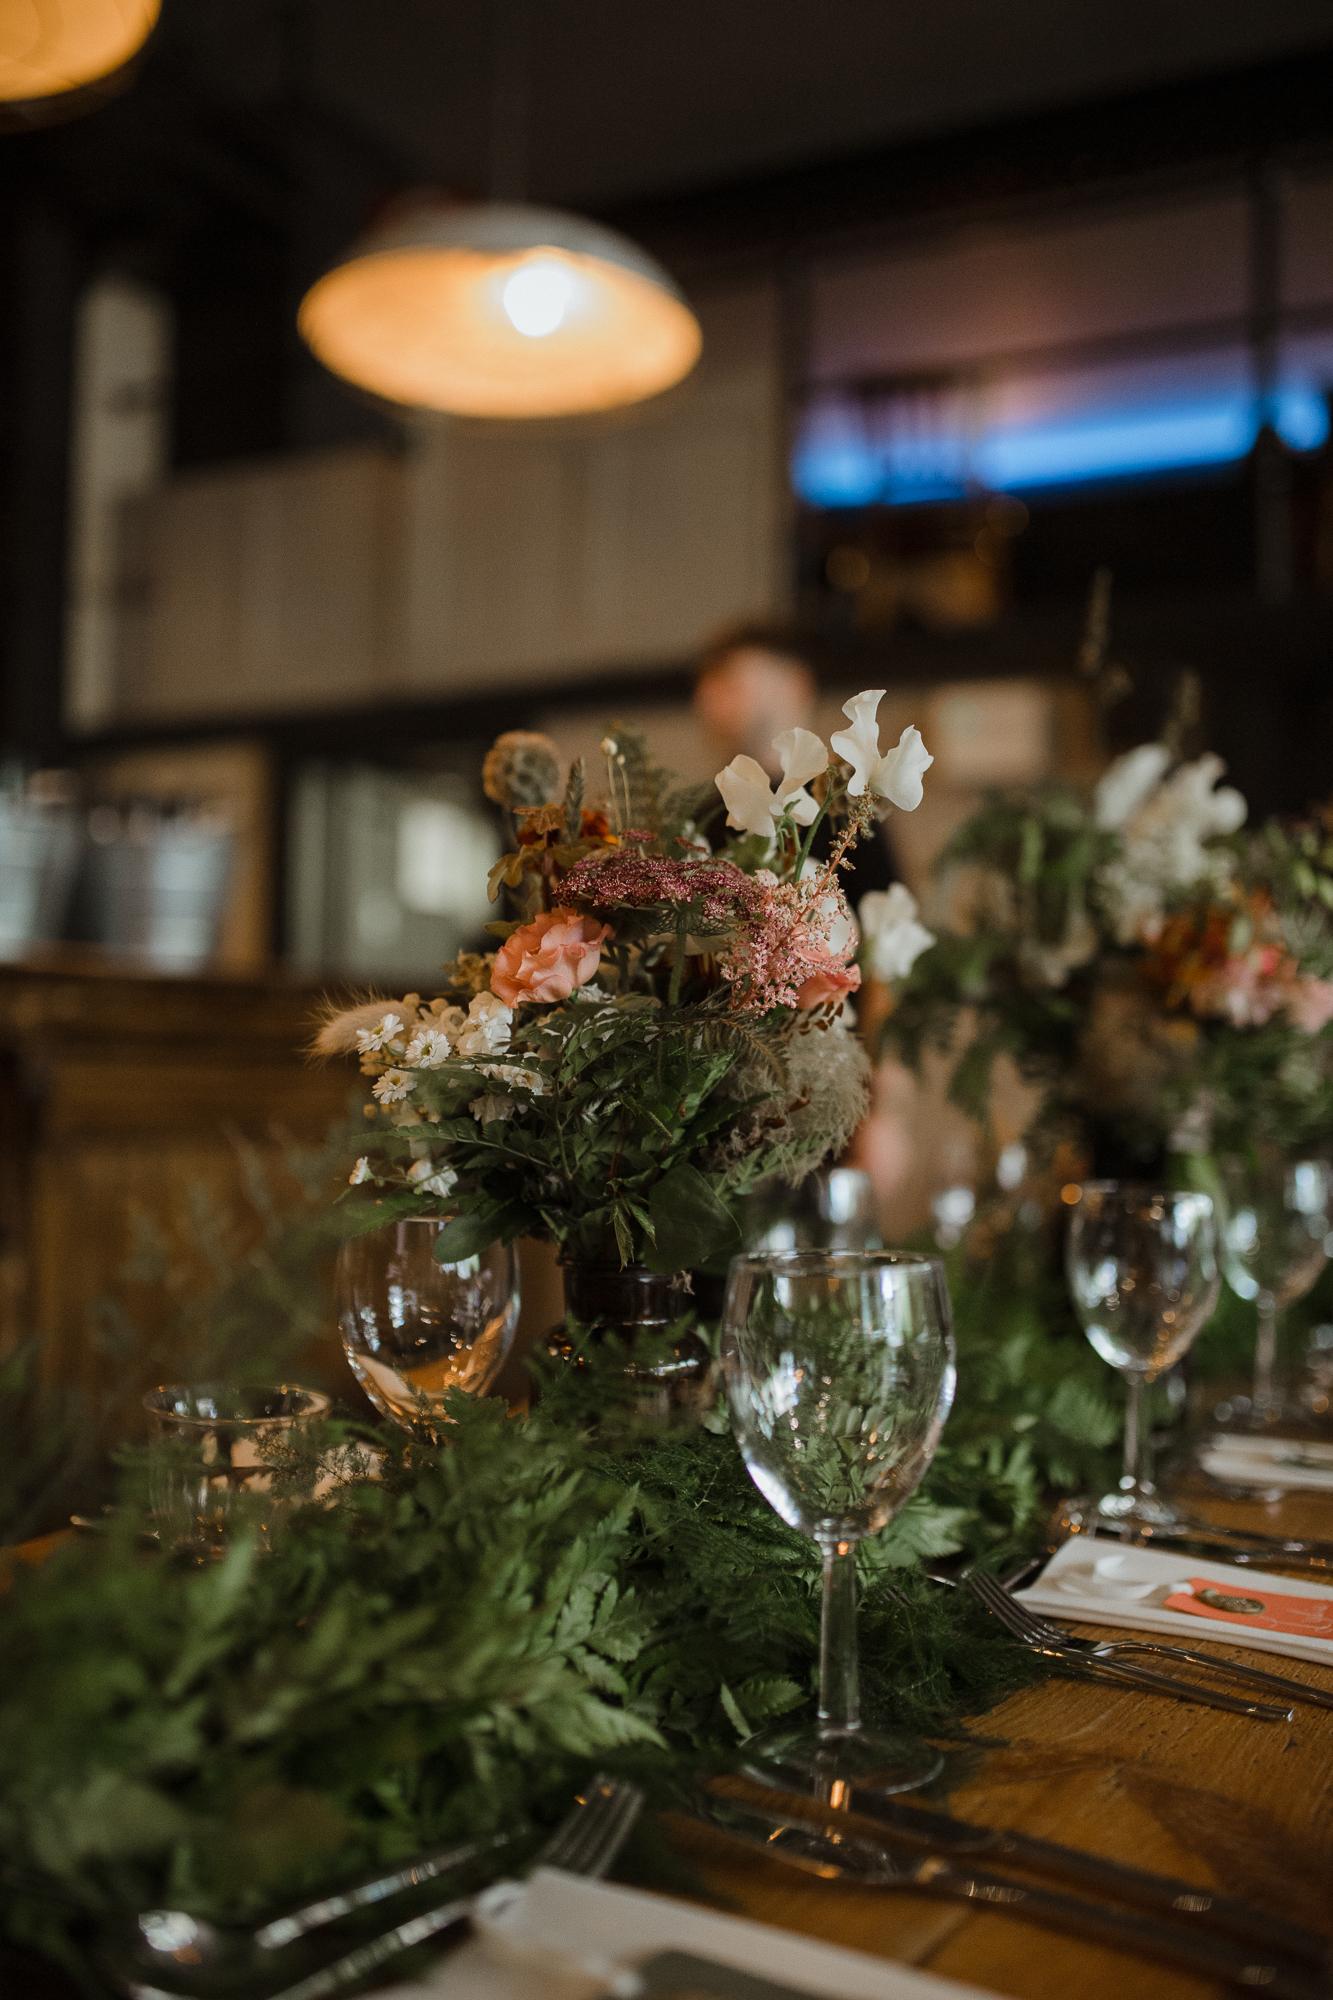 stephanie-green-wedding-photography-sulaflowers-sula-flowers-london-islington-town-hall-depot-n7-93.jpg